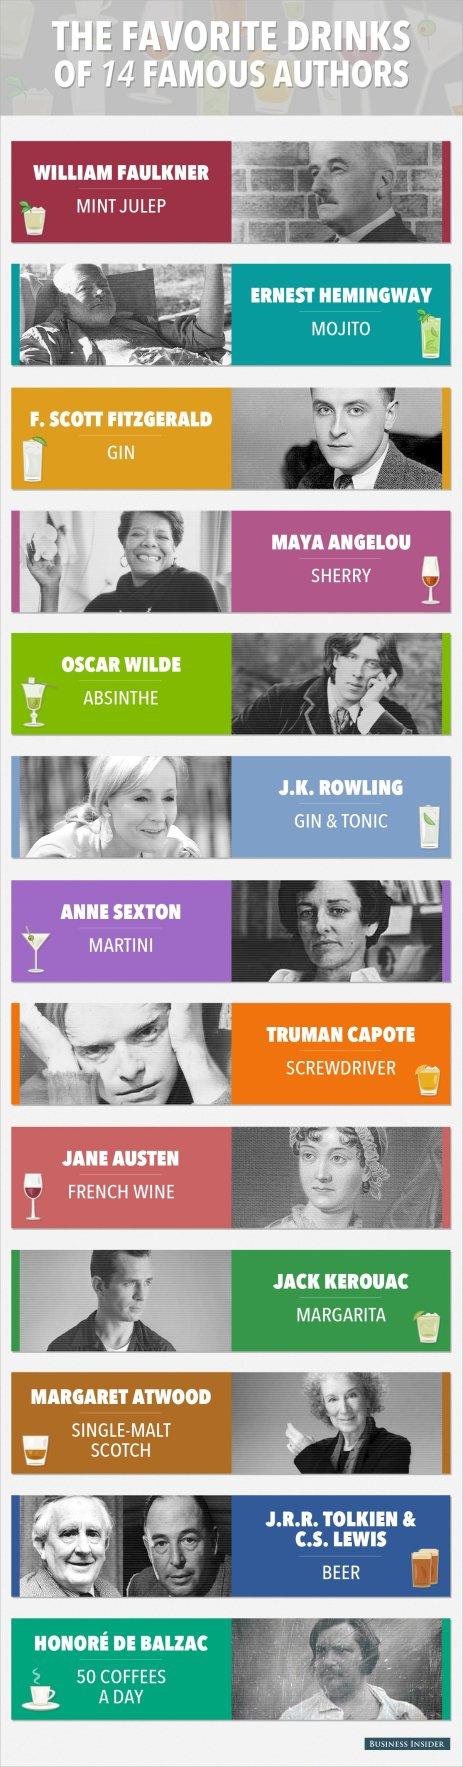 famous-authors-favorite-drinks_800px